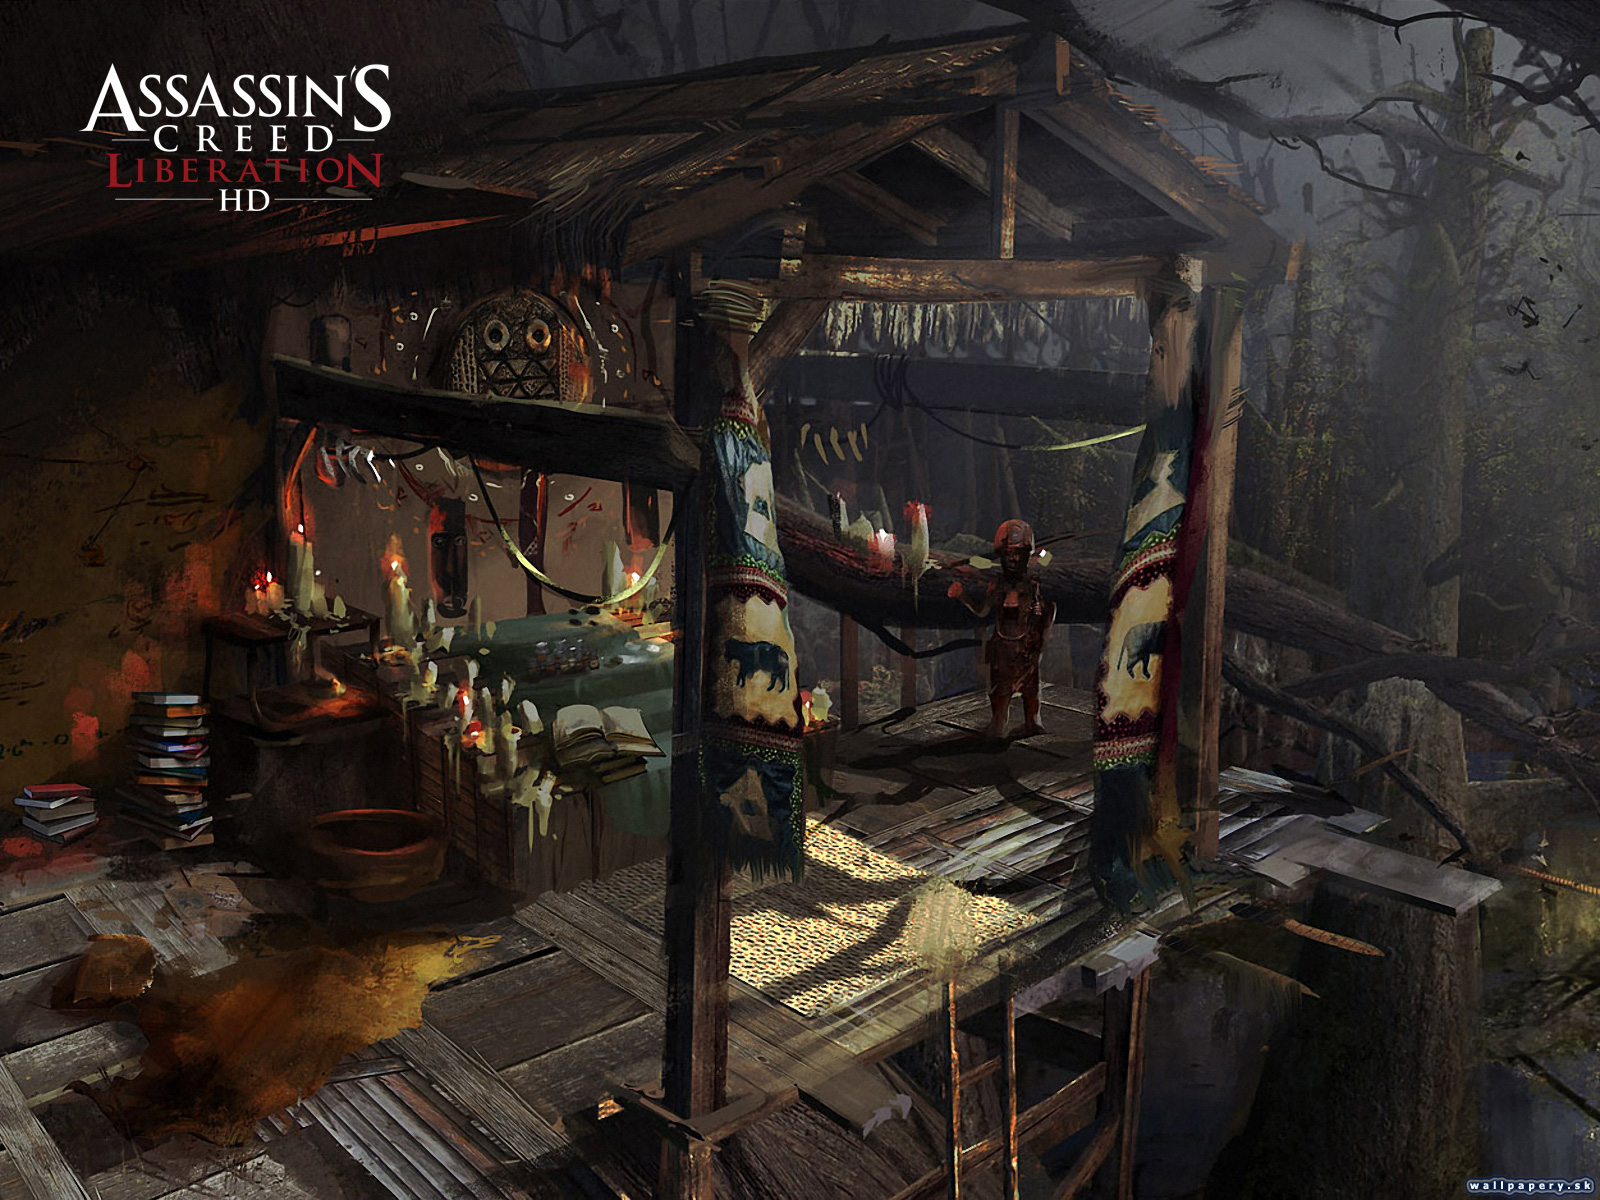 Assassins Creed Liberation HD  Wallpaper 3 ABCgamessk